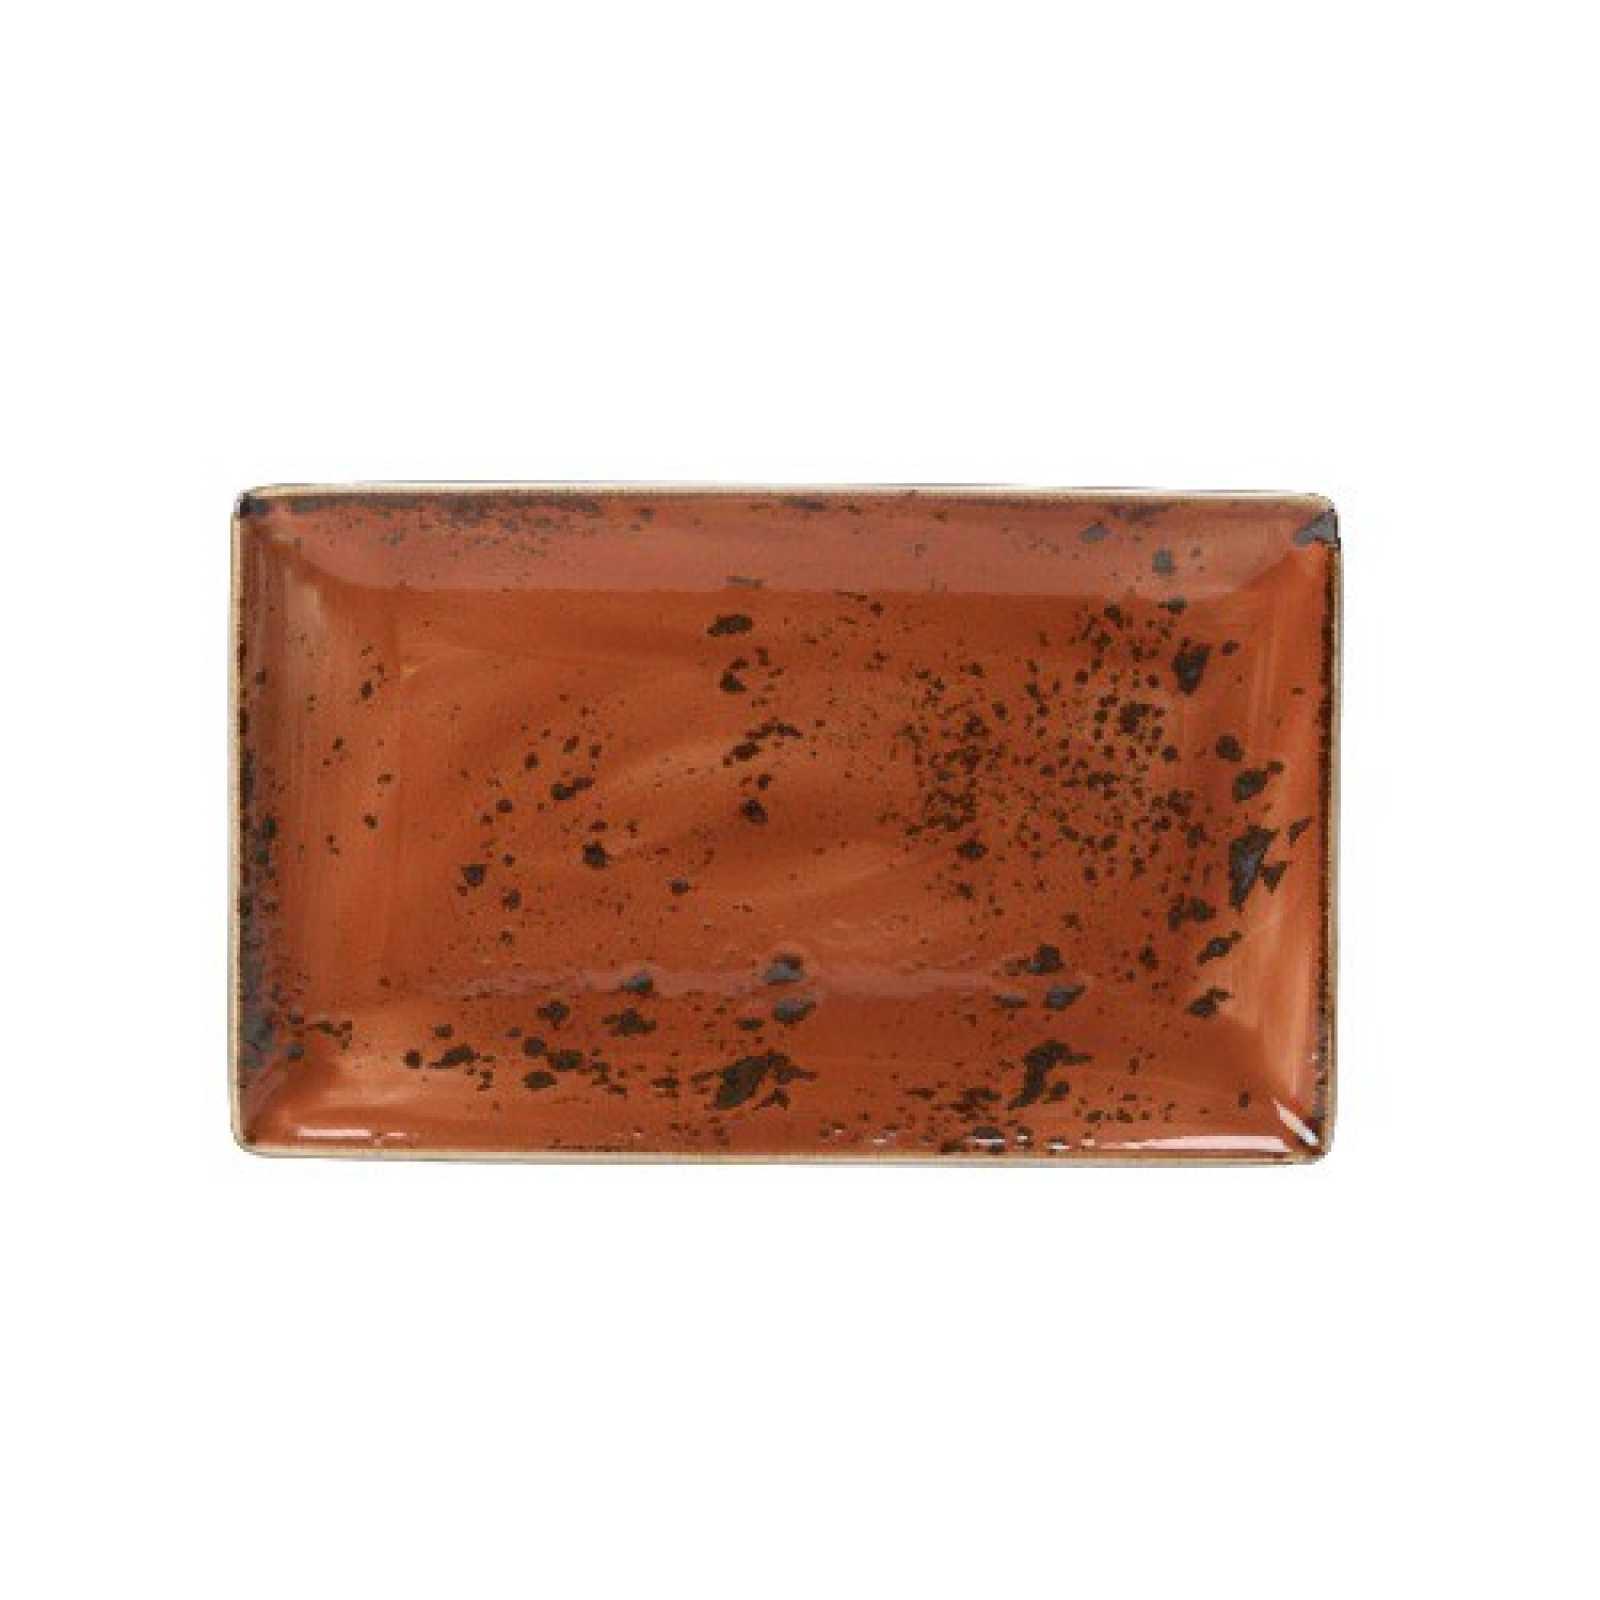 Онлайн каталог PROMENU: Блюдо прямоугольное Steelite CRAFT TERRACOTTA, 27х16,75 см, оранжевый Steelite 11330550